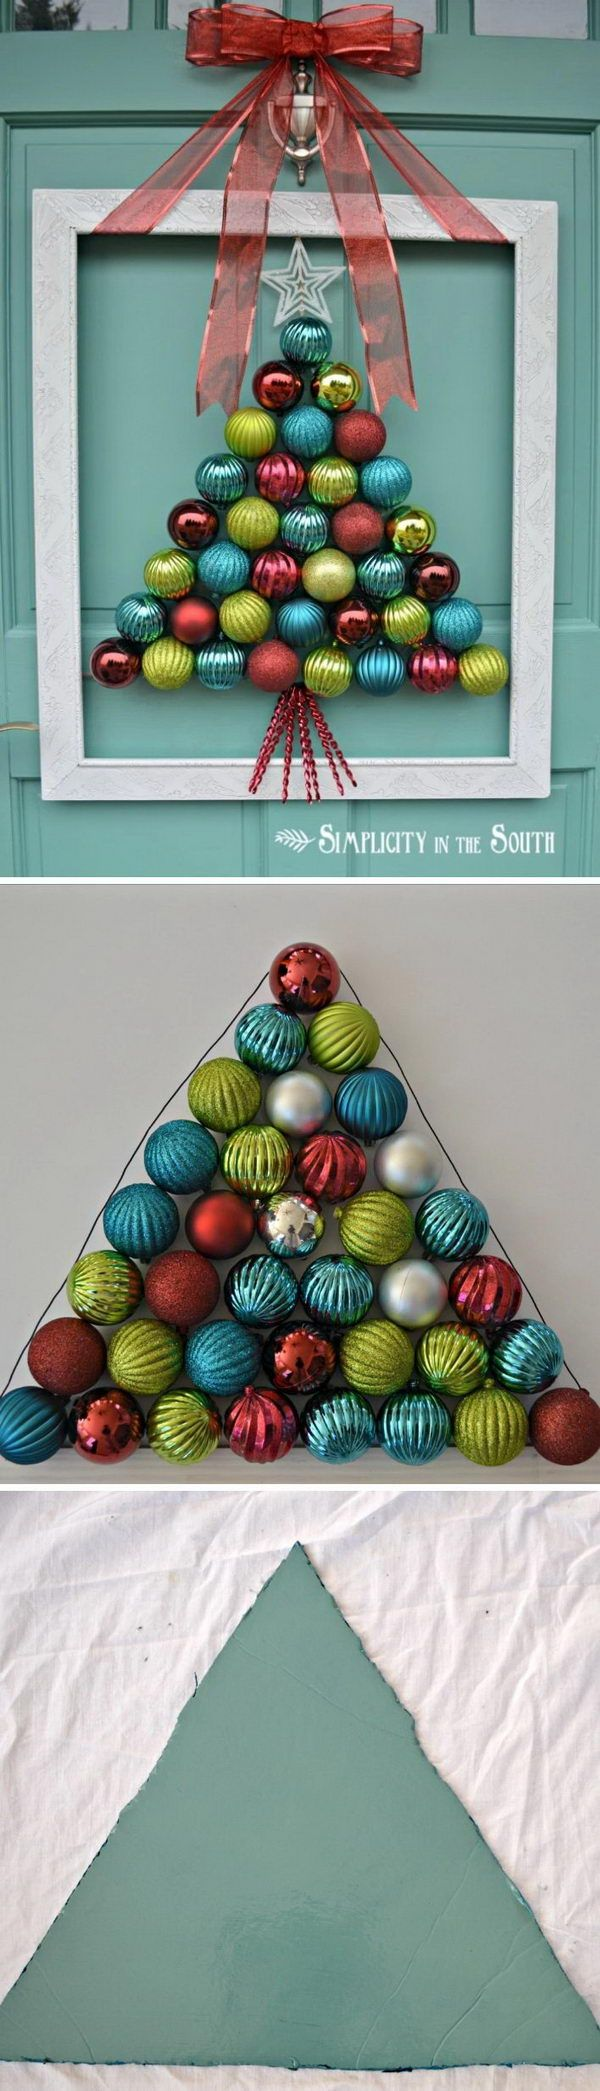 Framed christmas tree ornament wreath pinteres framed christmas tree ornament wreath solutioingenieria Choice Image